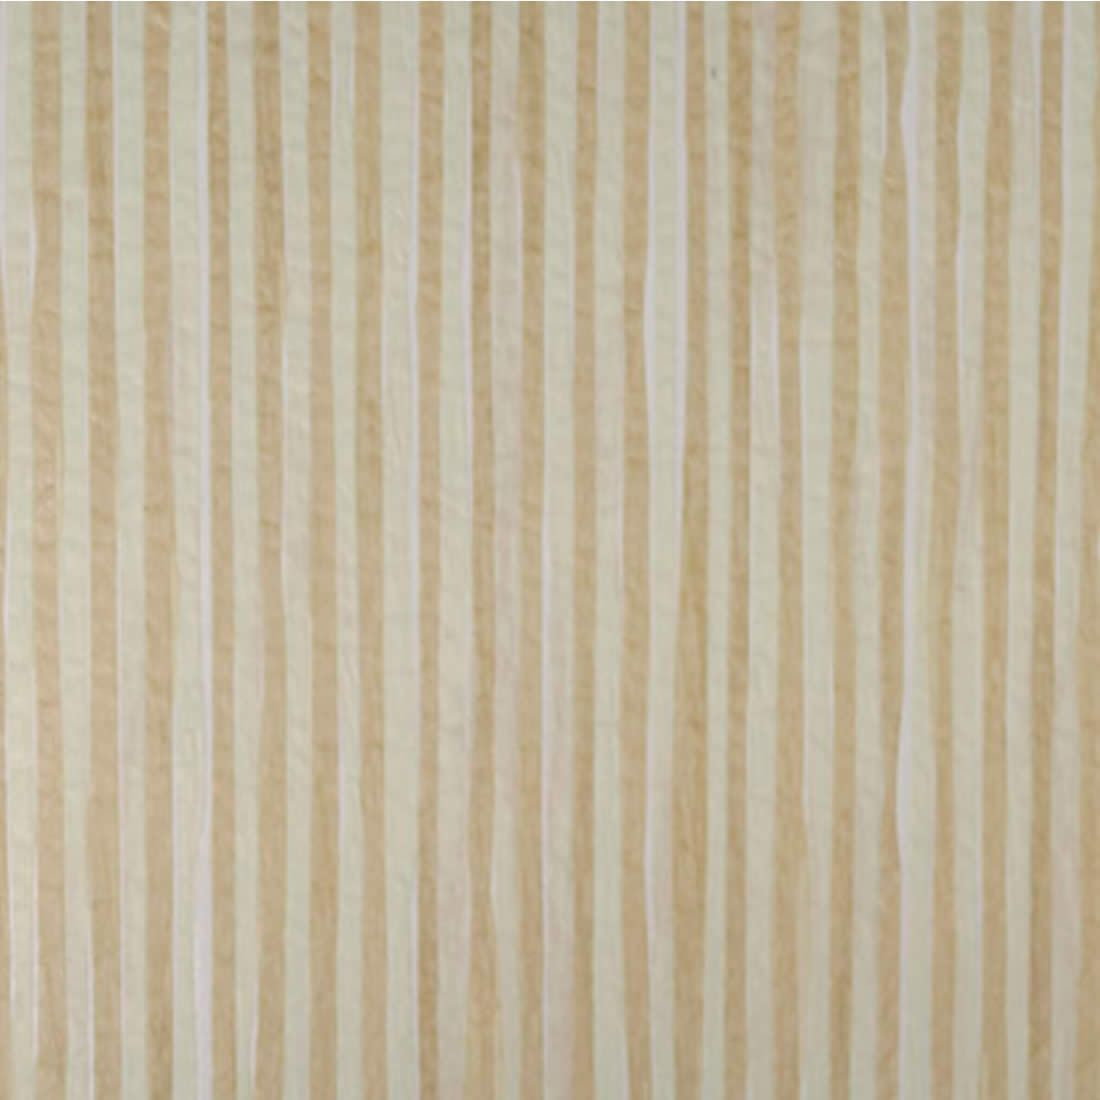 Papel de Parede Palha Natural Ref V6873 Paper Land